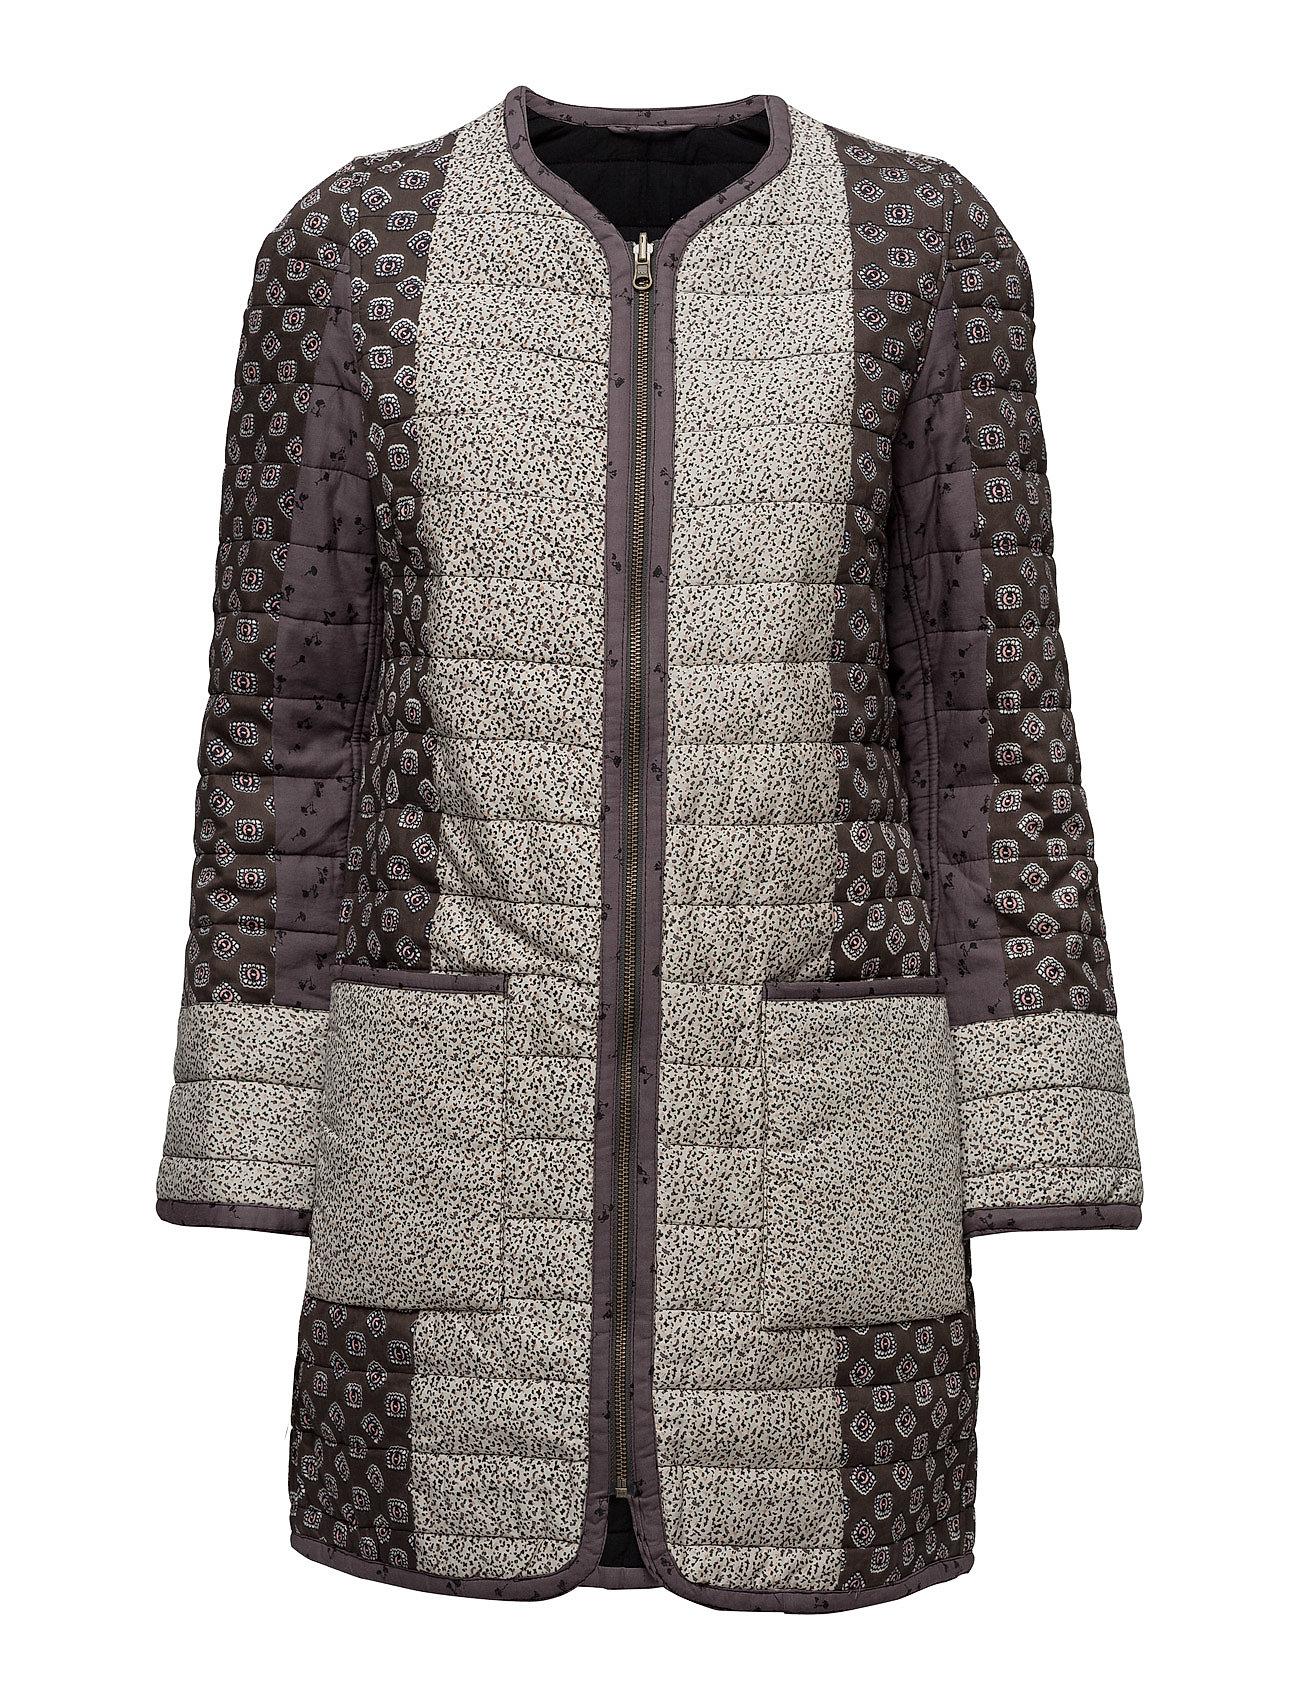 De coolaste Light Outerwear Noa Noa Coats till Kvinnor till varje ... 5b1b04002cf8c